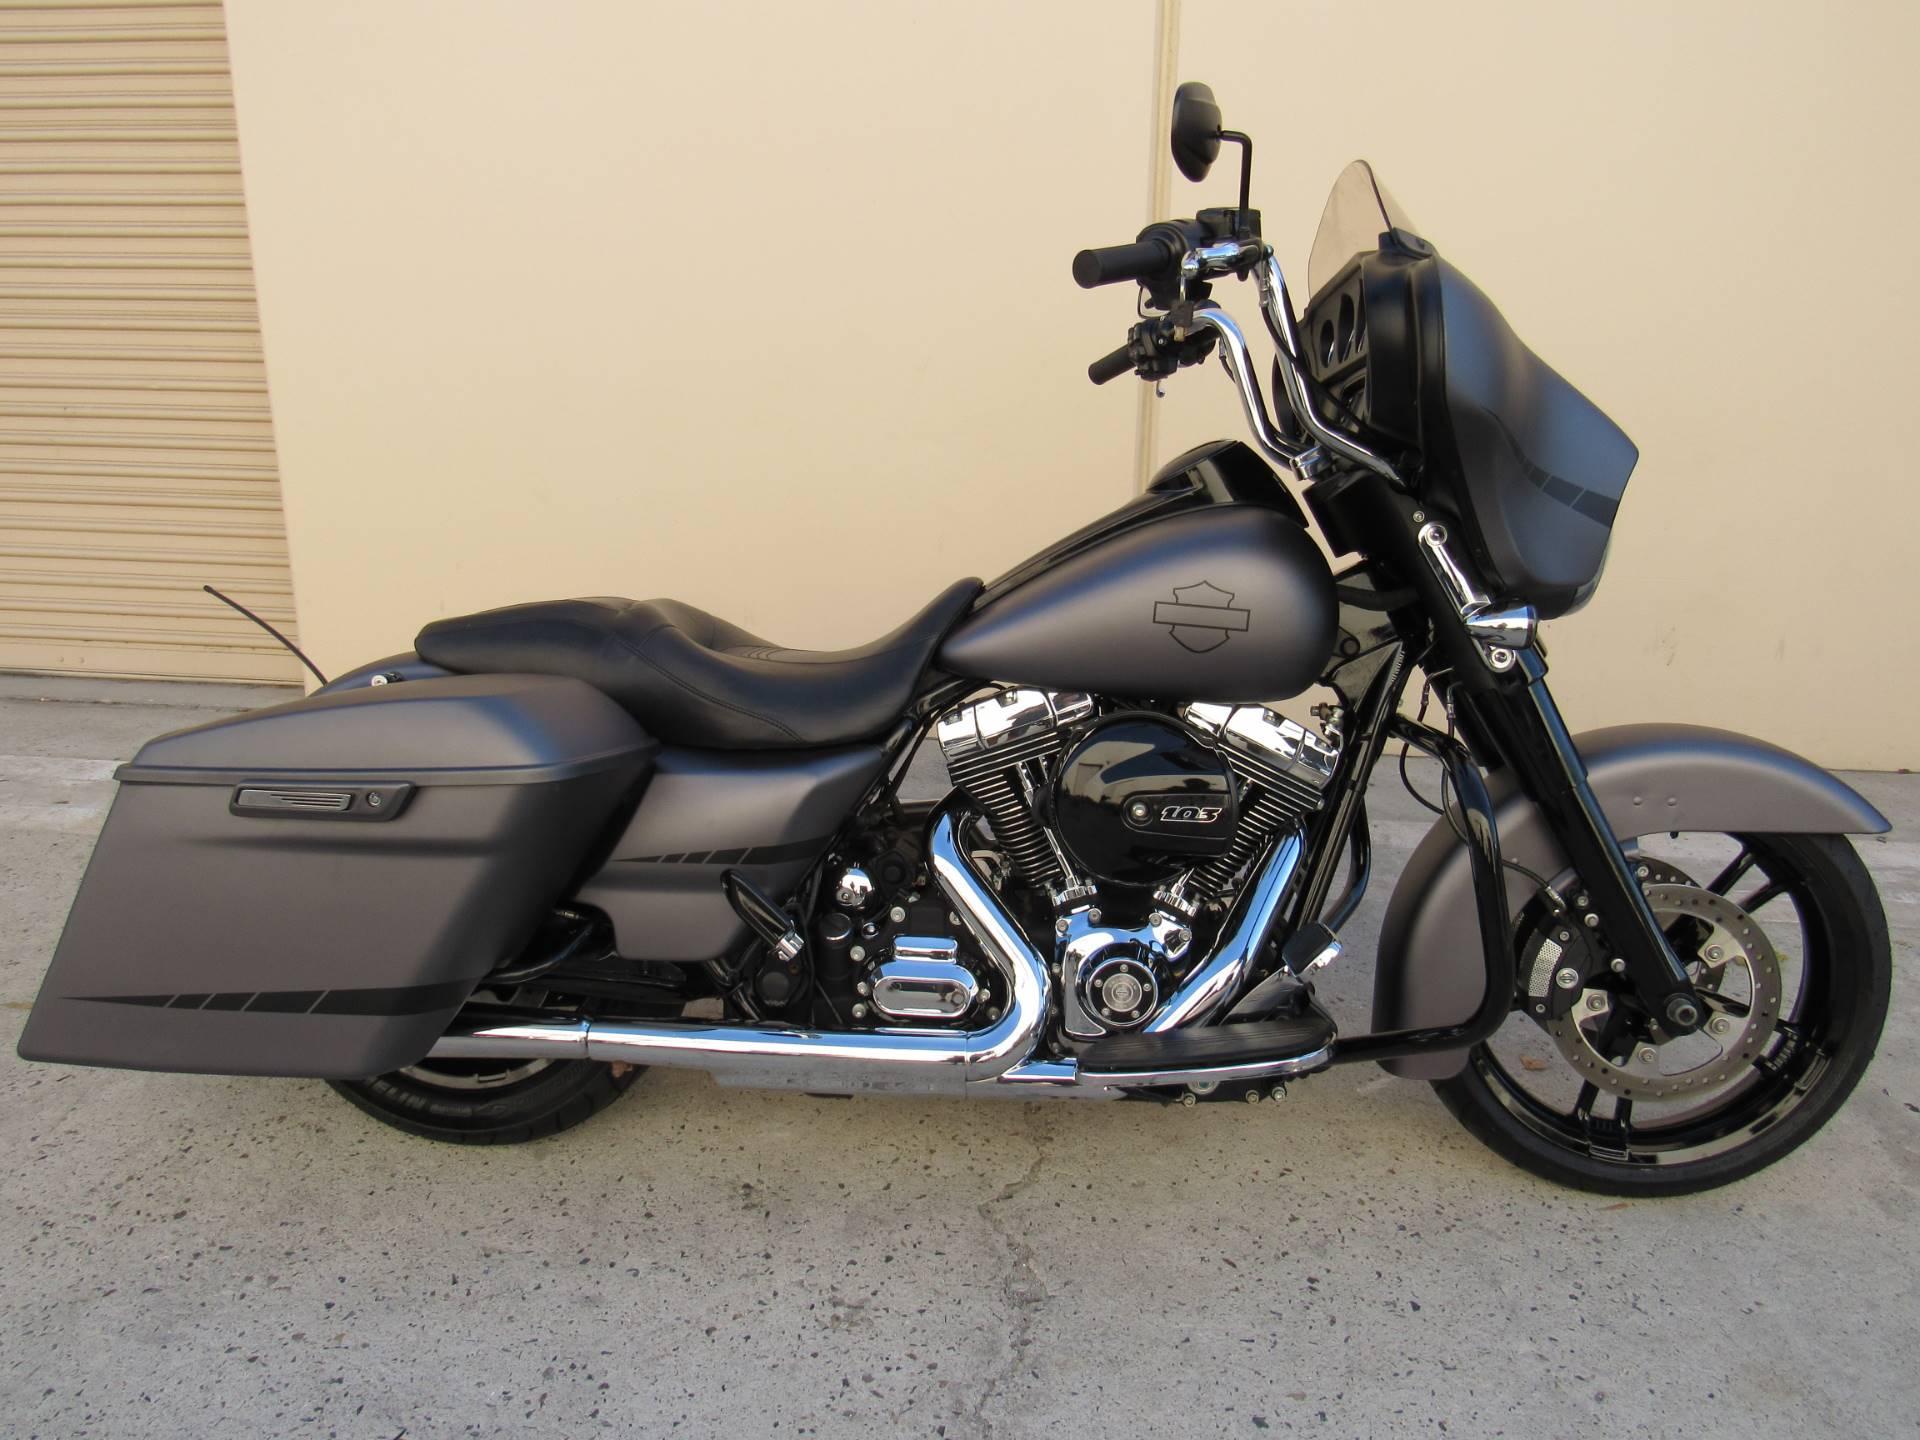 Used 2015 Harley Davidson Street Glide Motorcycles In Temecula Ca